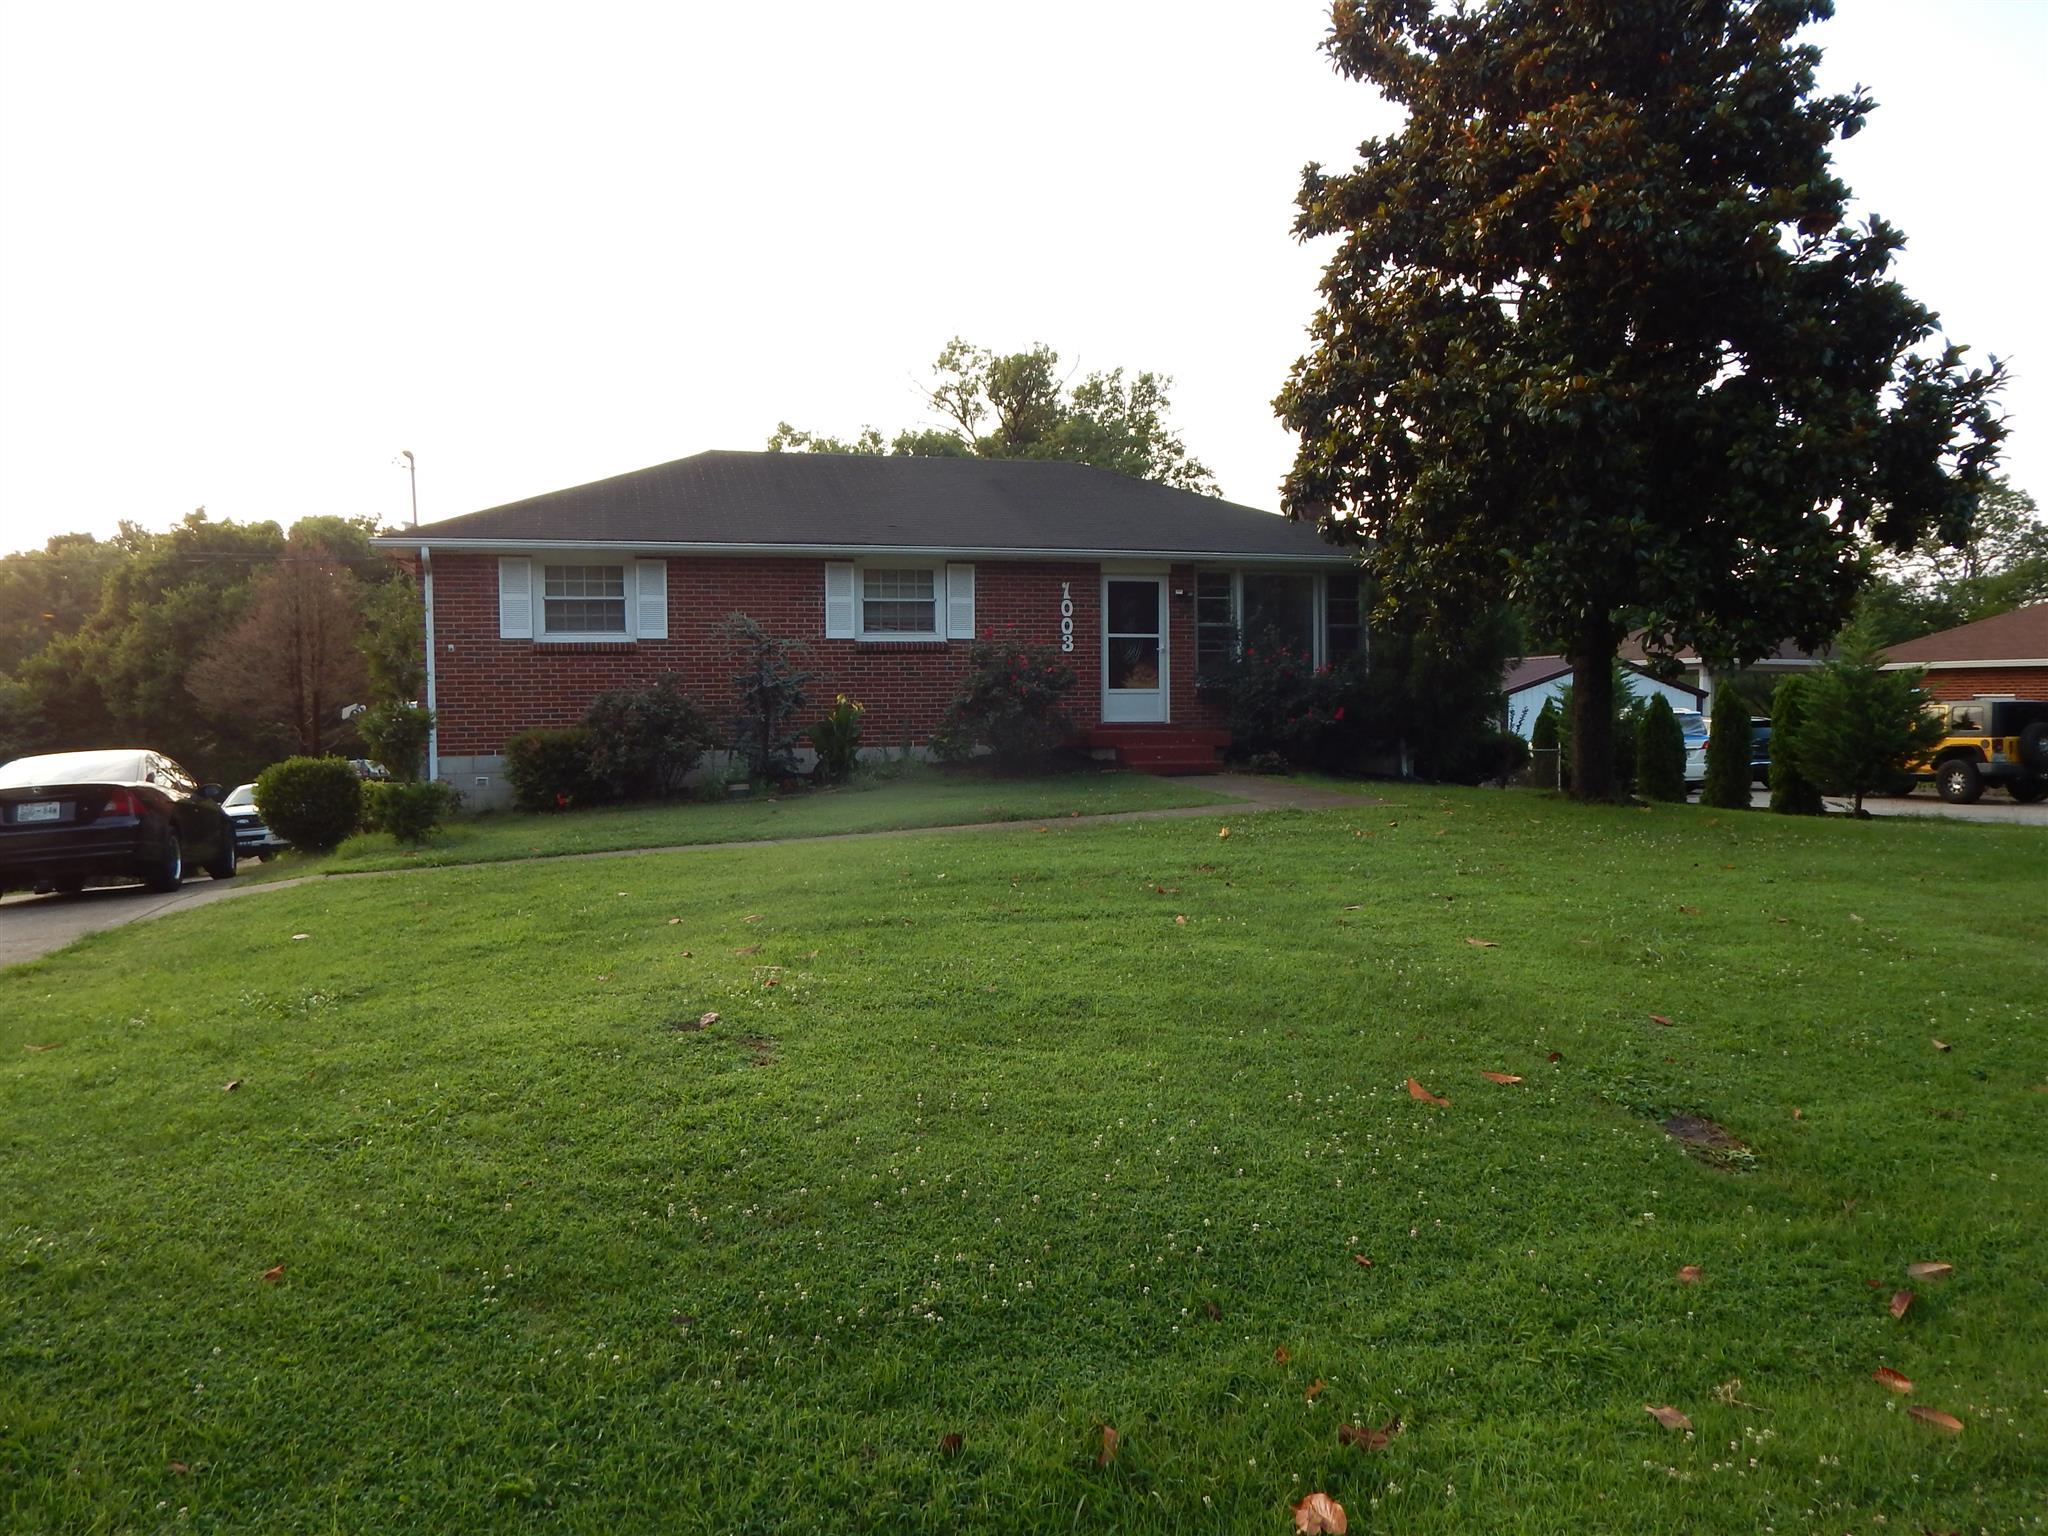 Photo of 1003 N Graycroft Ave  Madison  TN